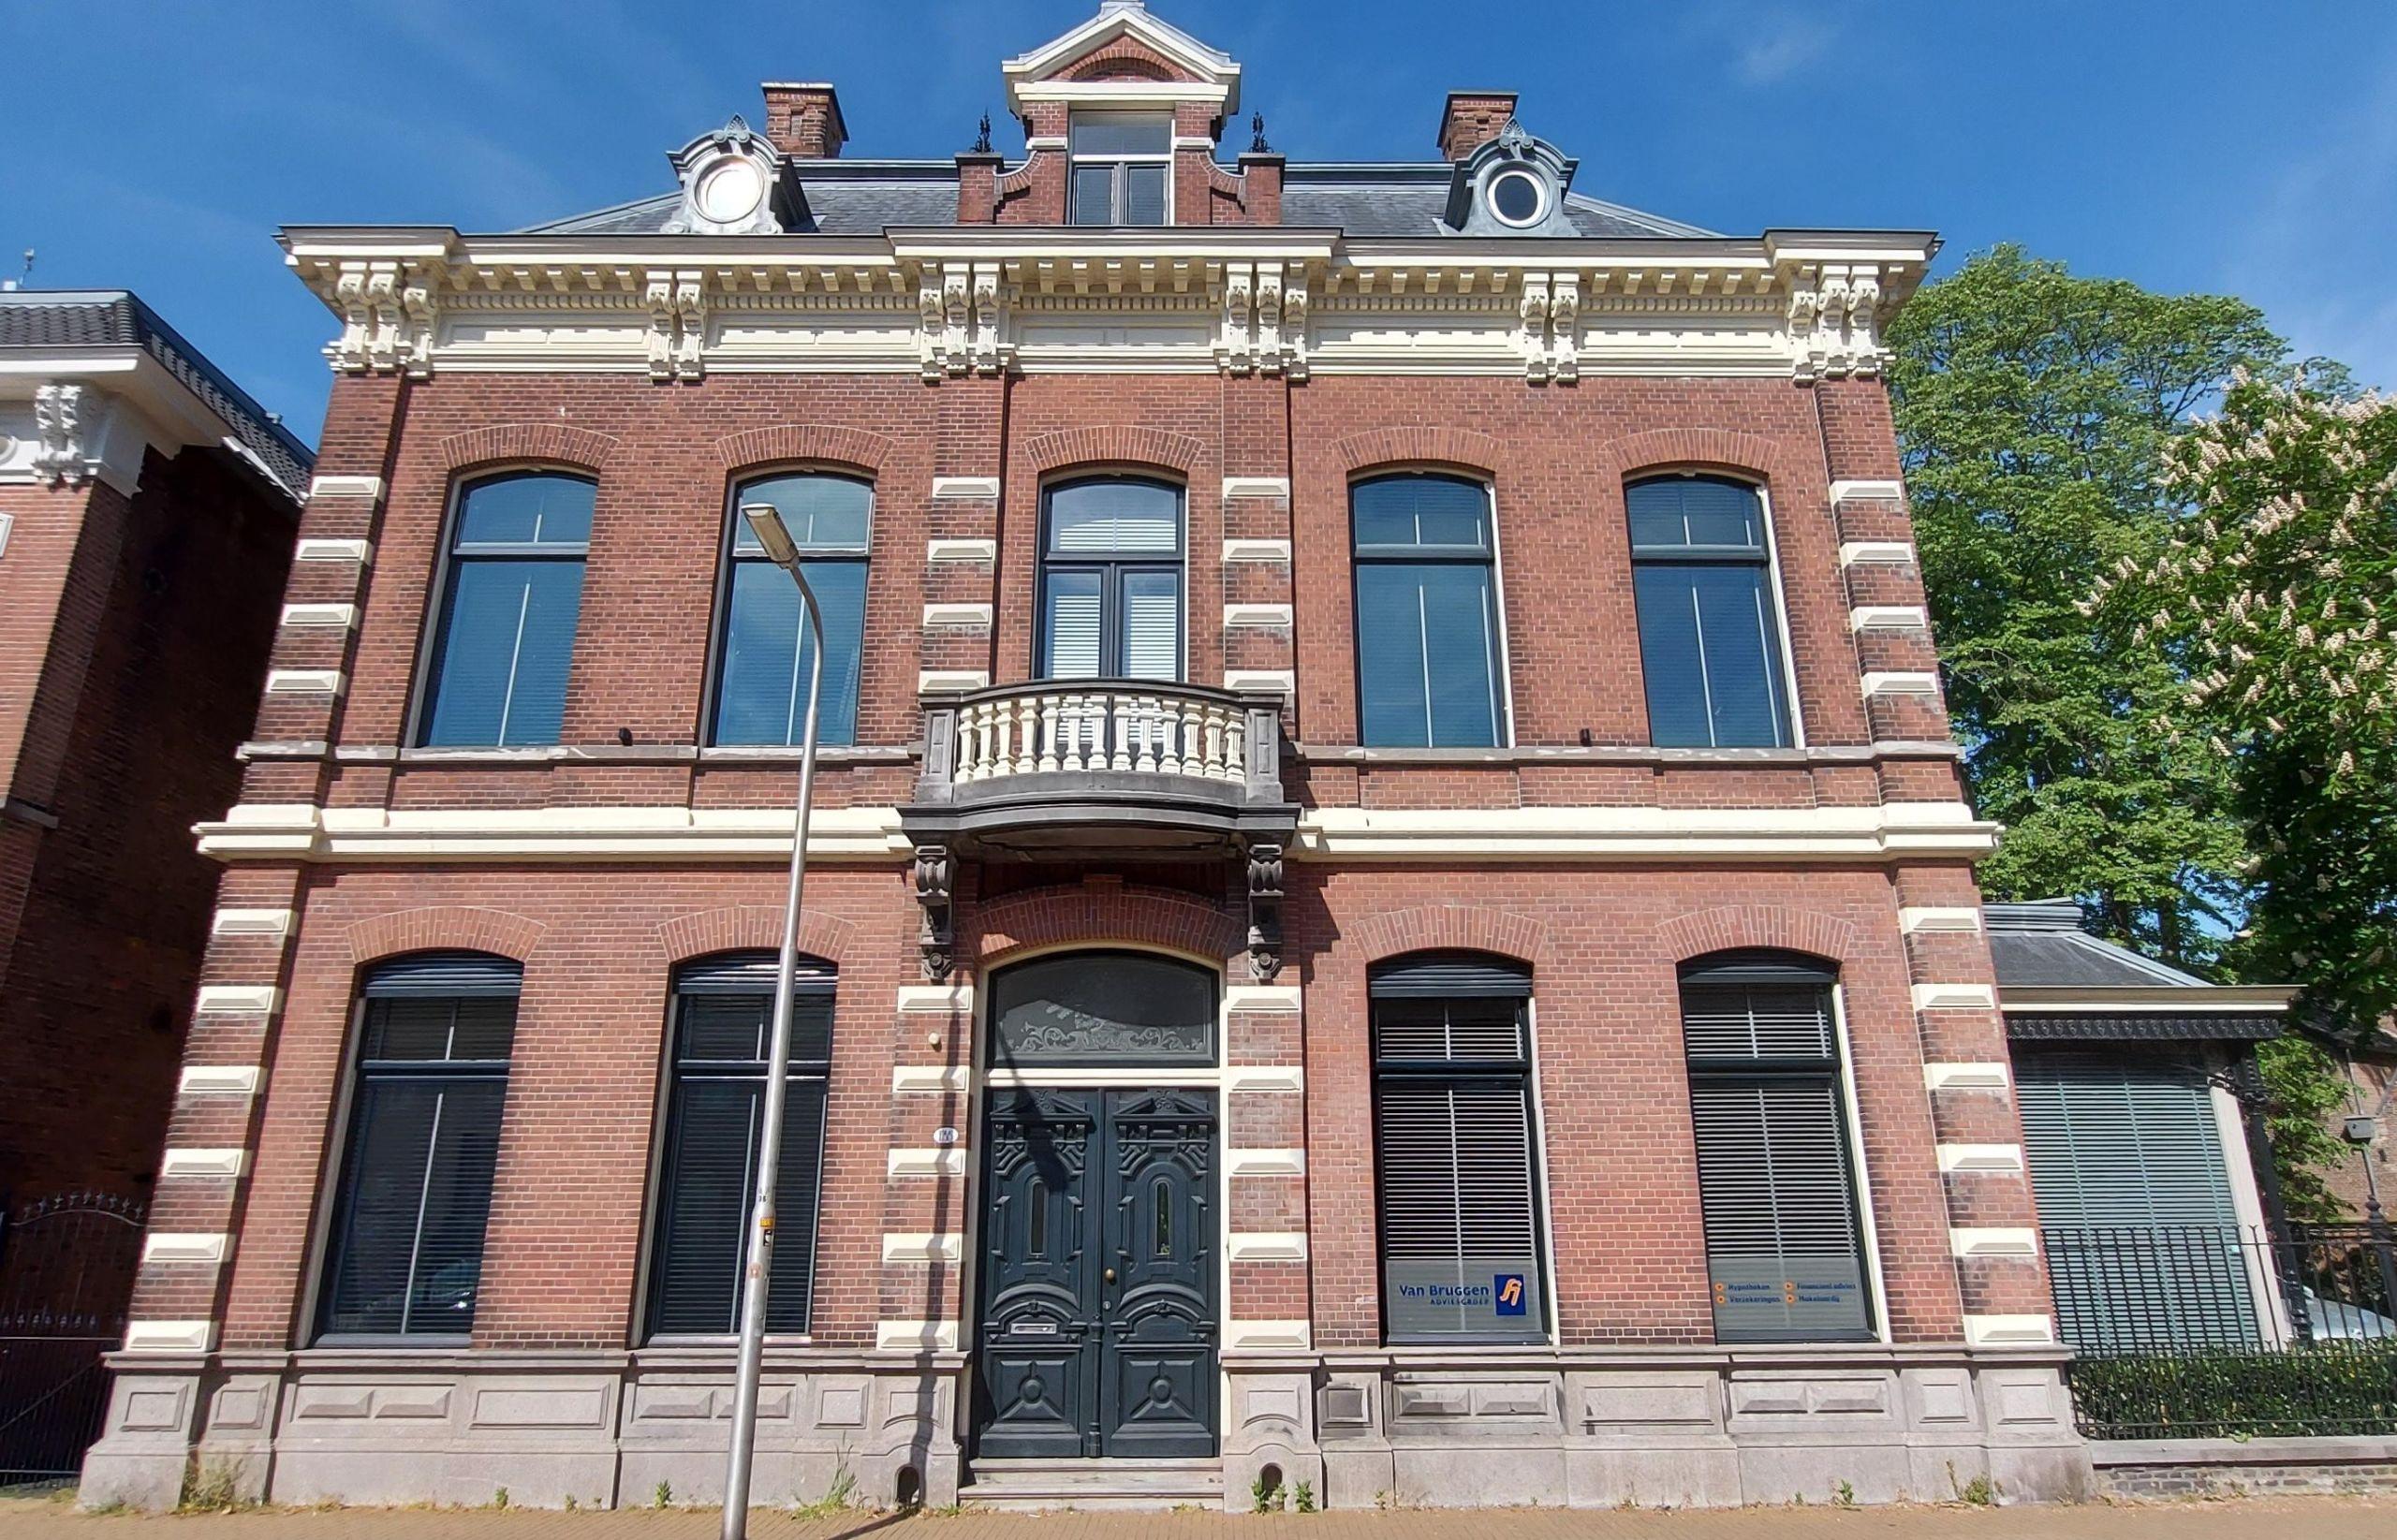 Studio Pimcy Sint Josephstraat 135 Tilburg